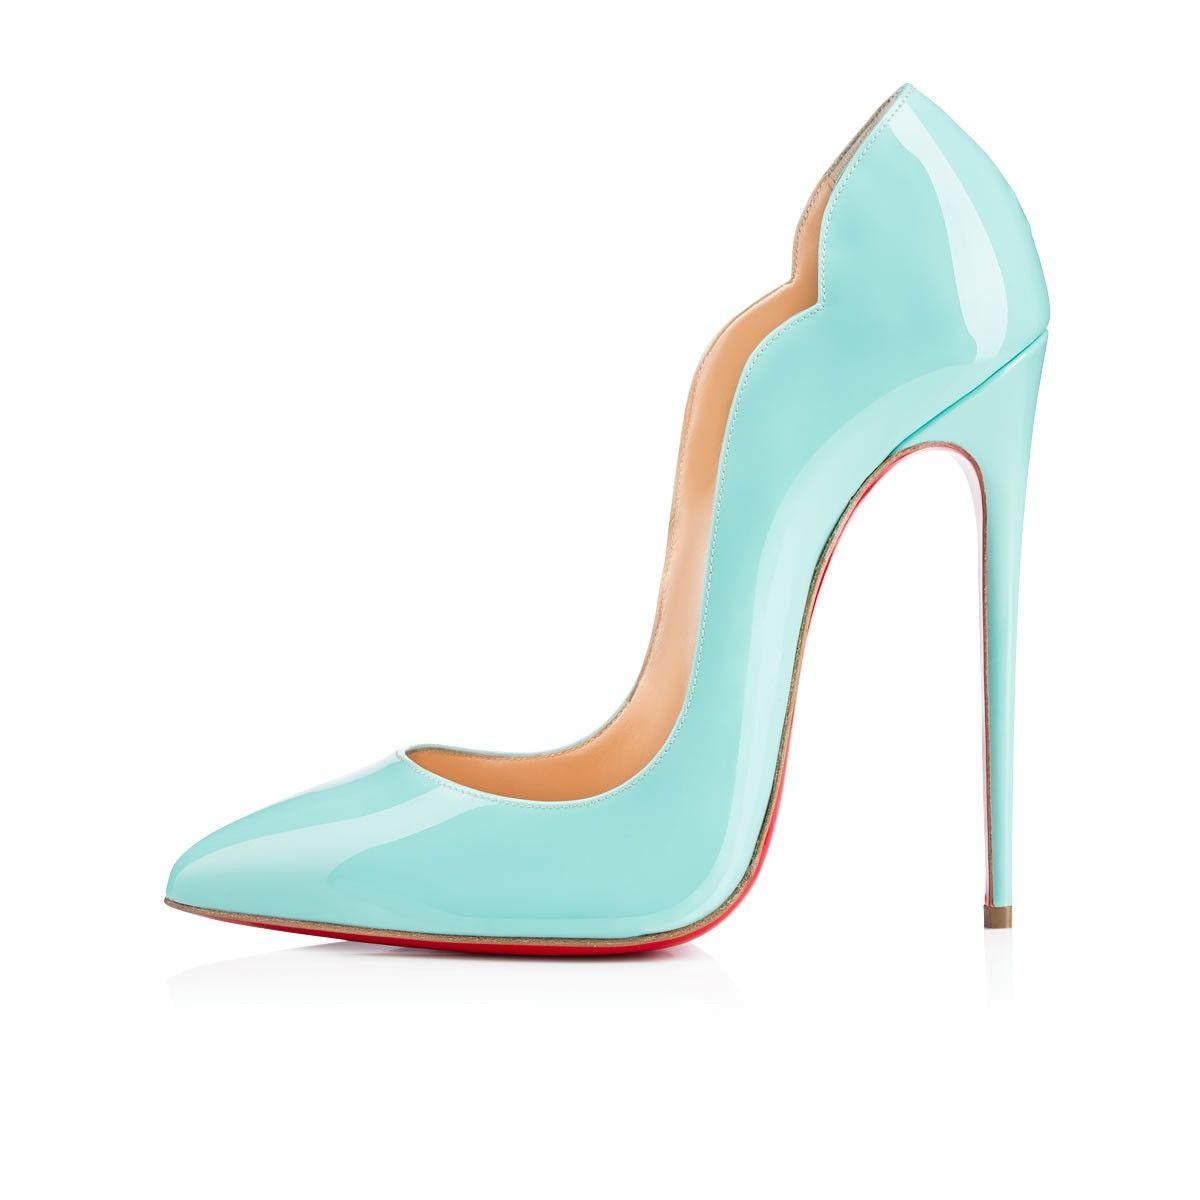 932763e86c9 Christian Louboutin Hot Chick | Shoes | Shoes, Shoes heels, Heels